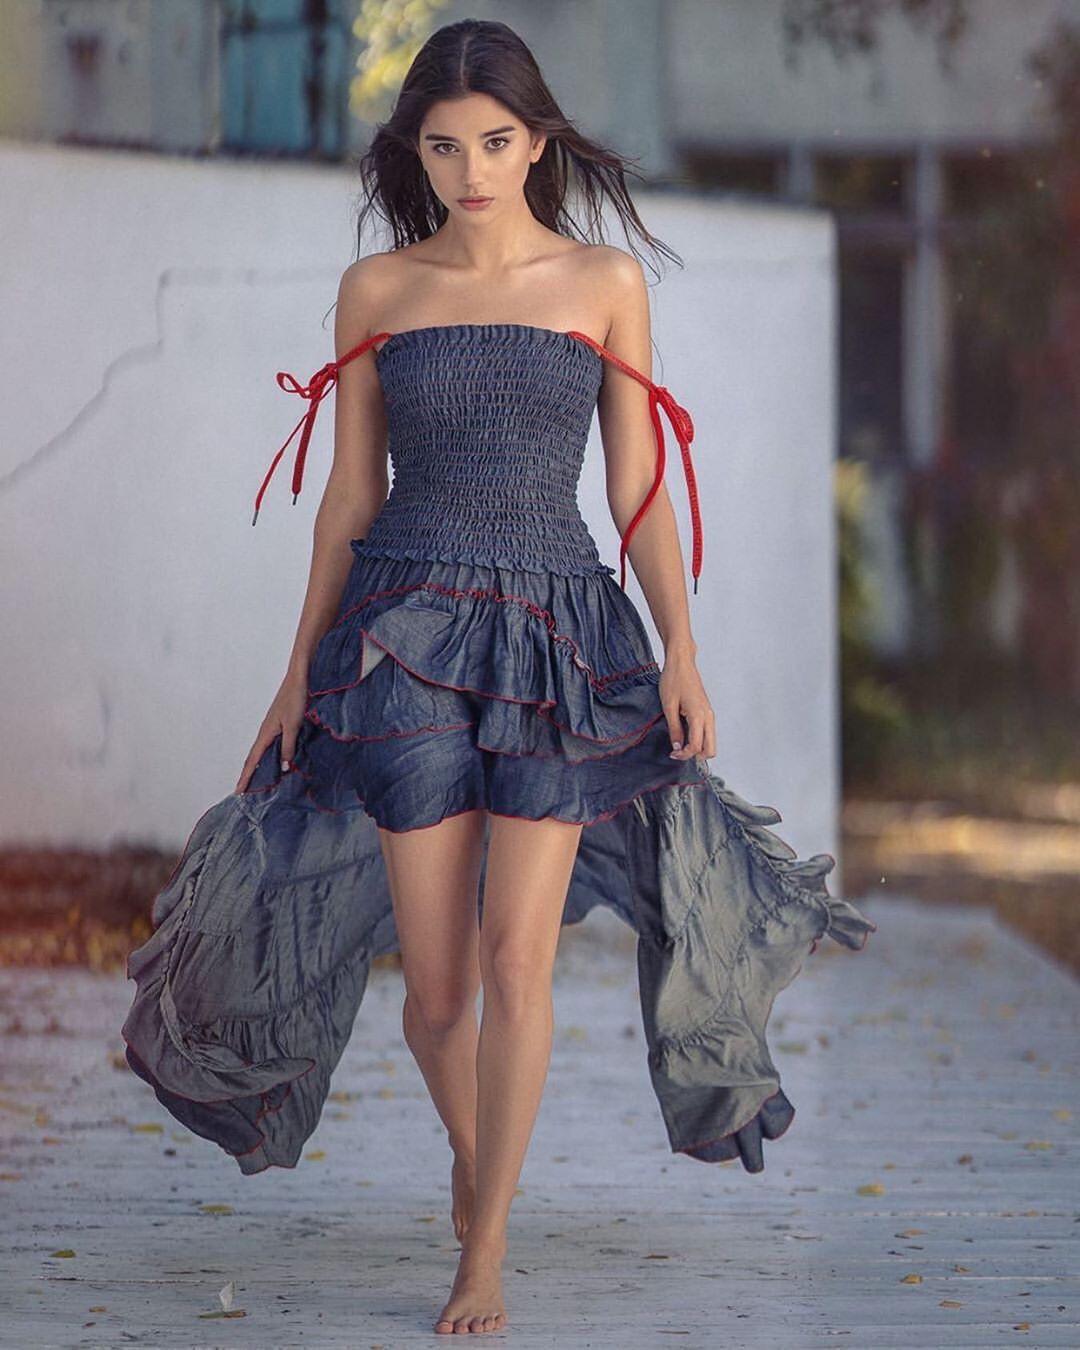 Maja Strojek dress matching dress, sexy leg picture, Sexy Models